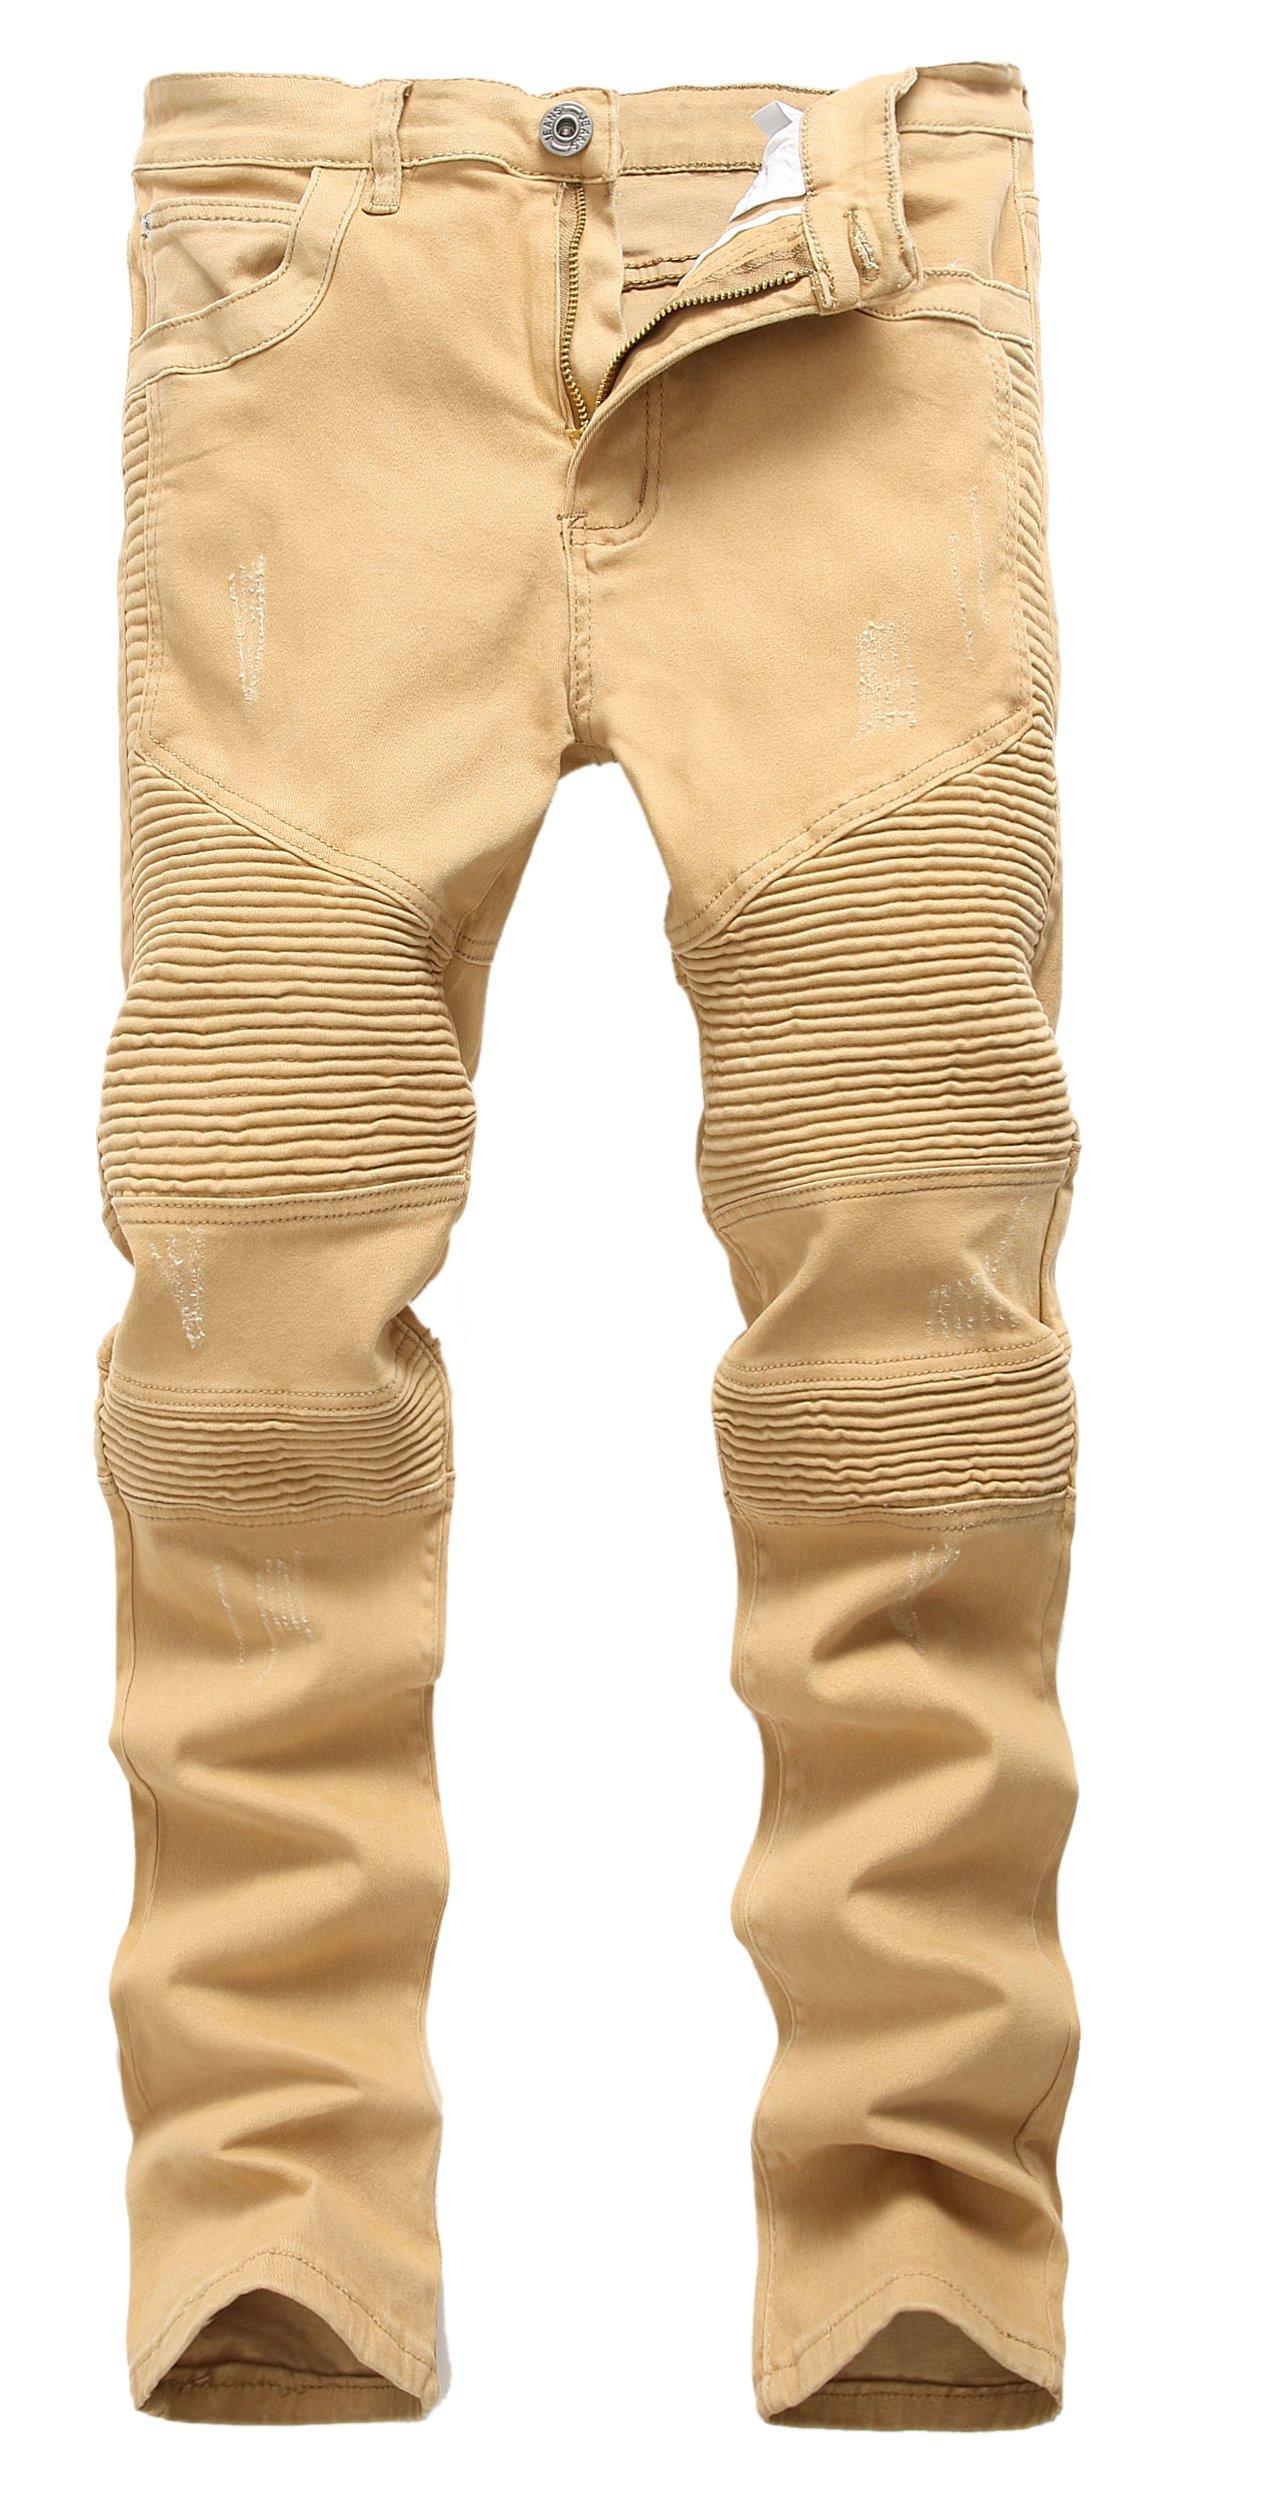 Men 's Khaki Biker Moto Distressed Destroyed Fashion Skinny Slim Fit Jeans 336khaki W34